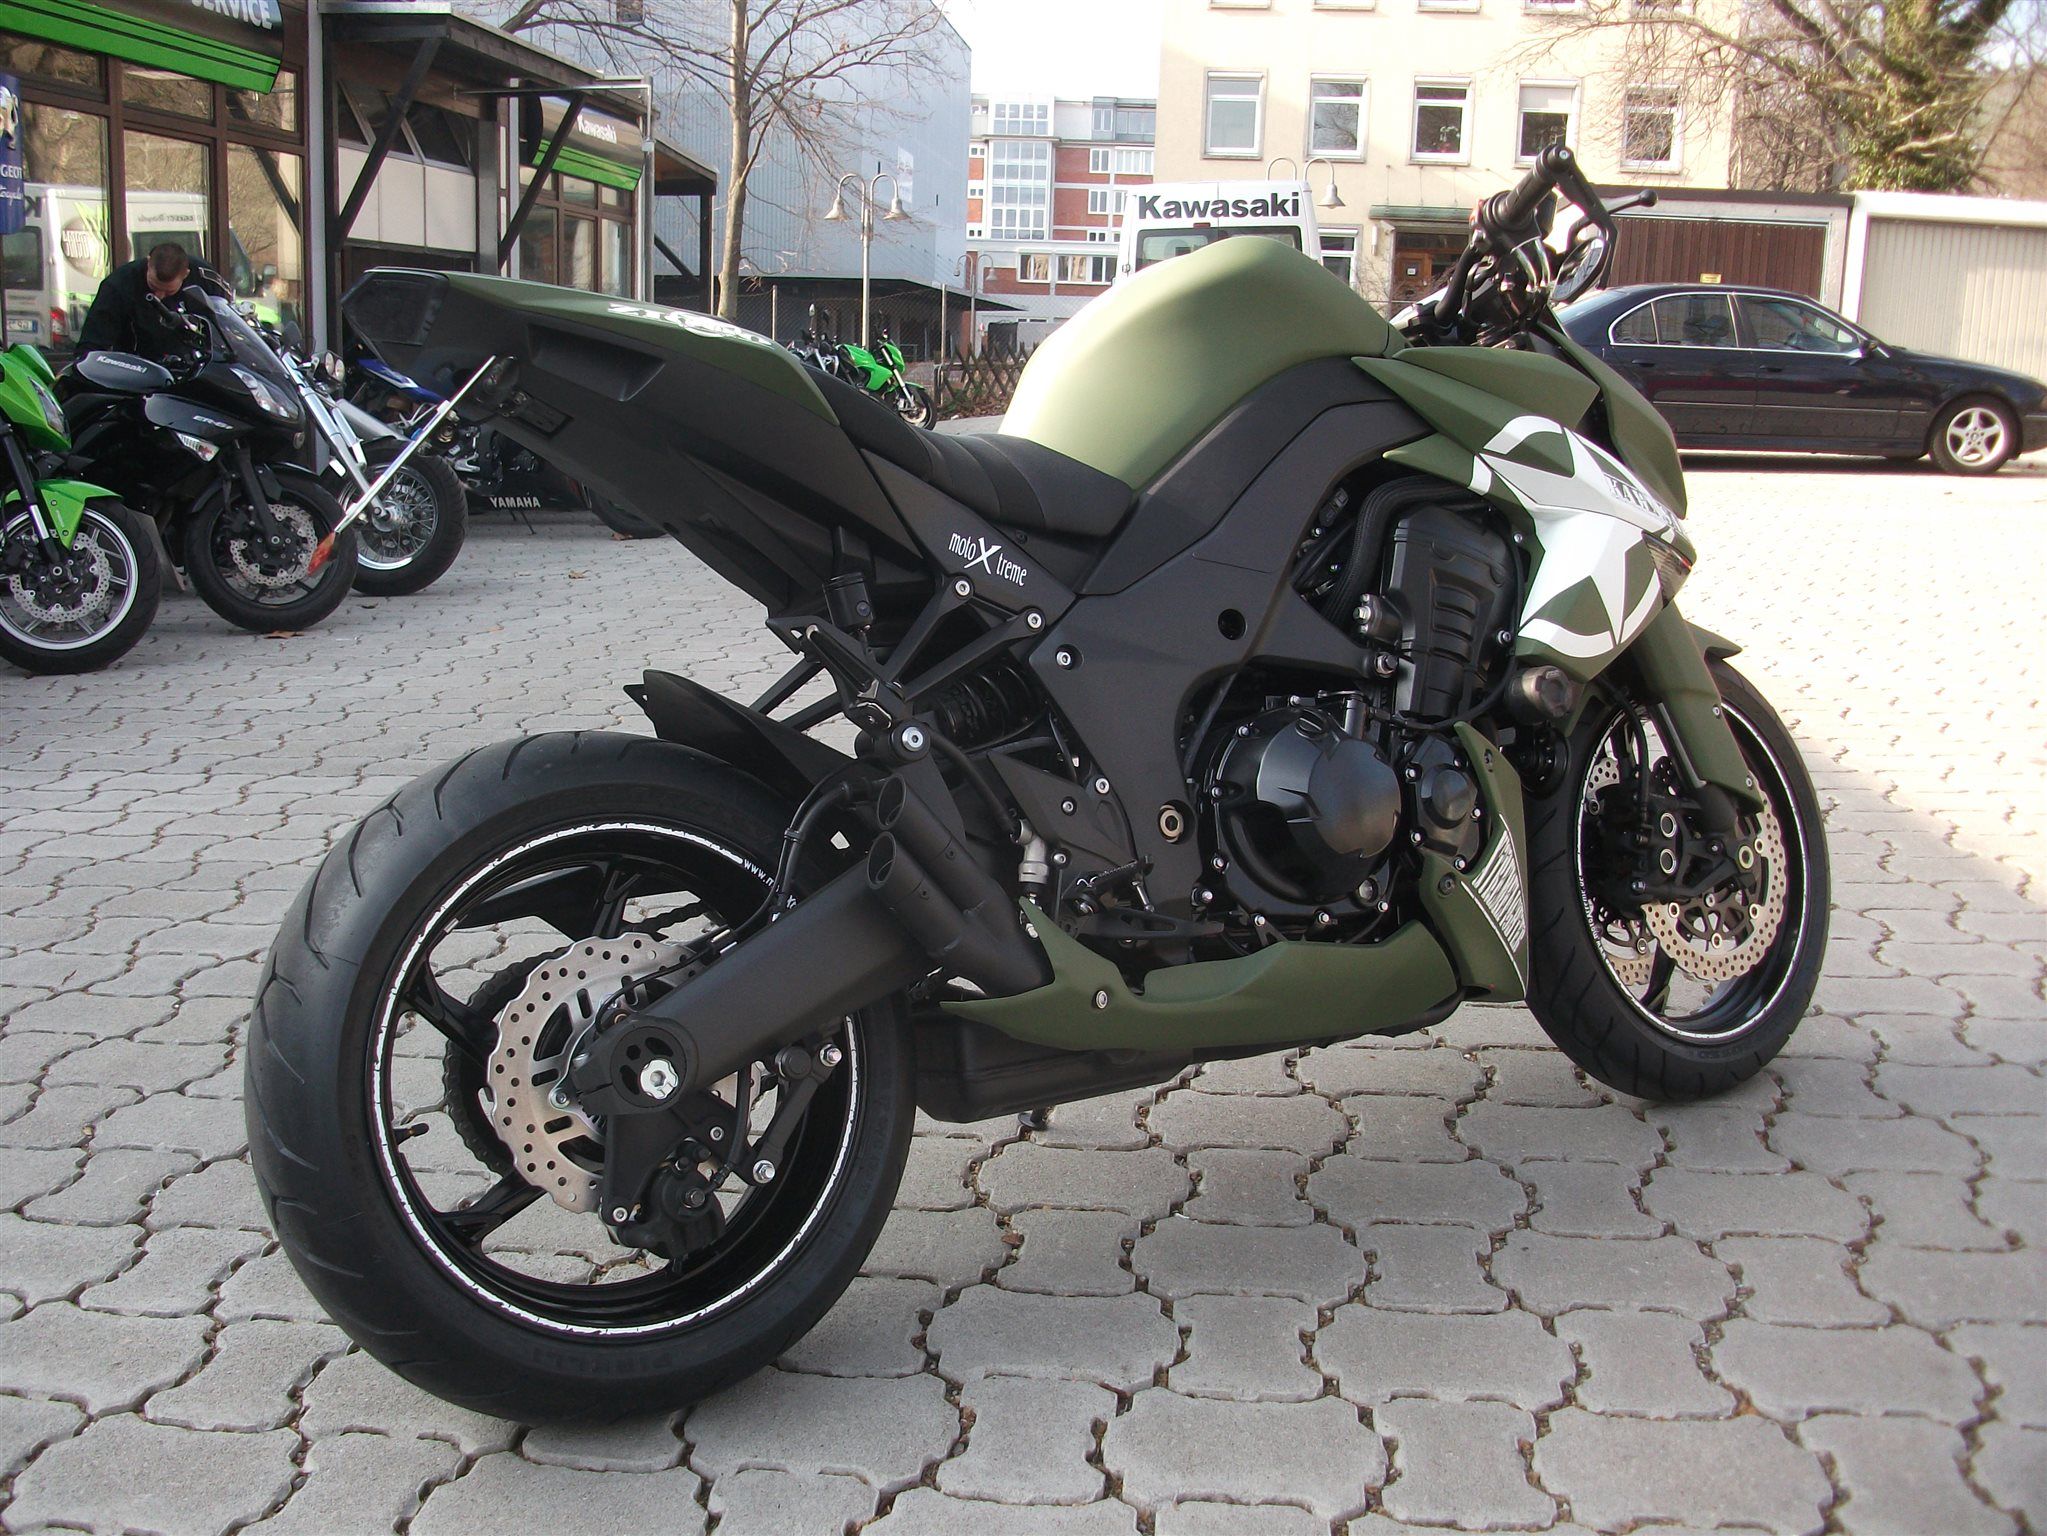 Umgebautes Motorrad Kawasaki Z1000 Von MotoXtreme GmbH